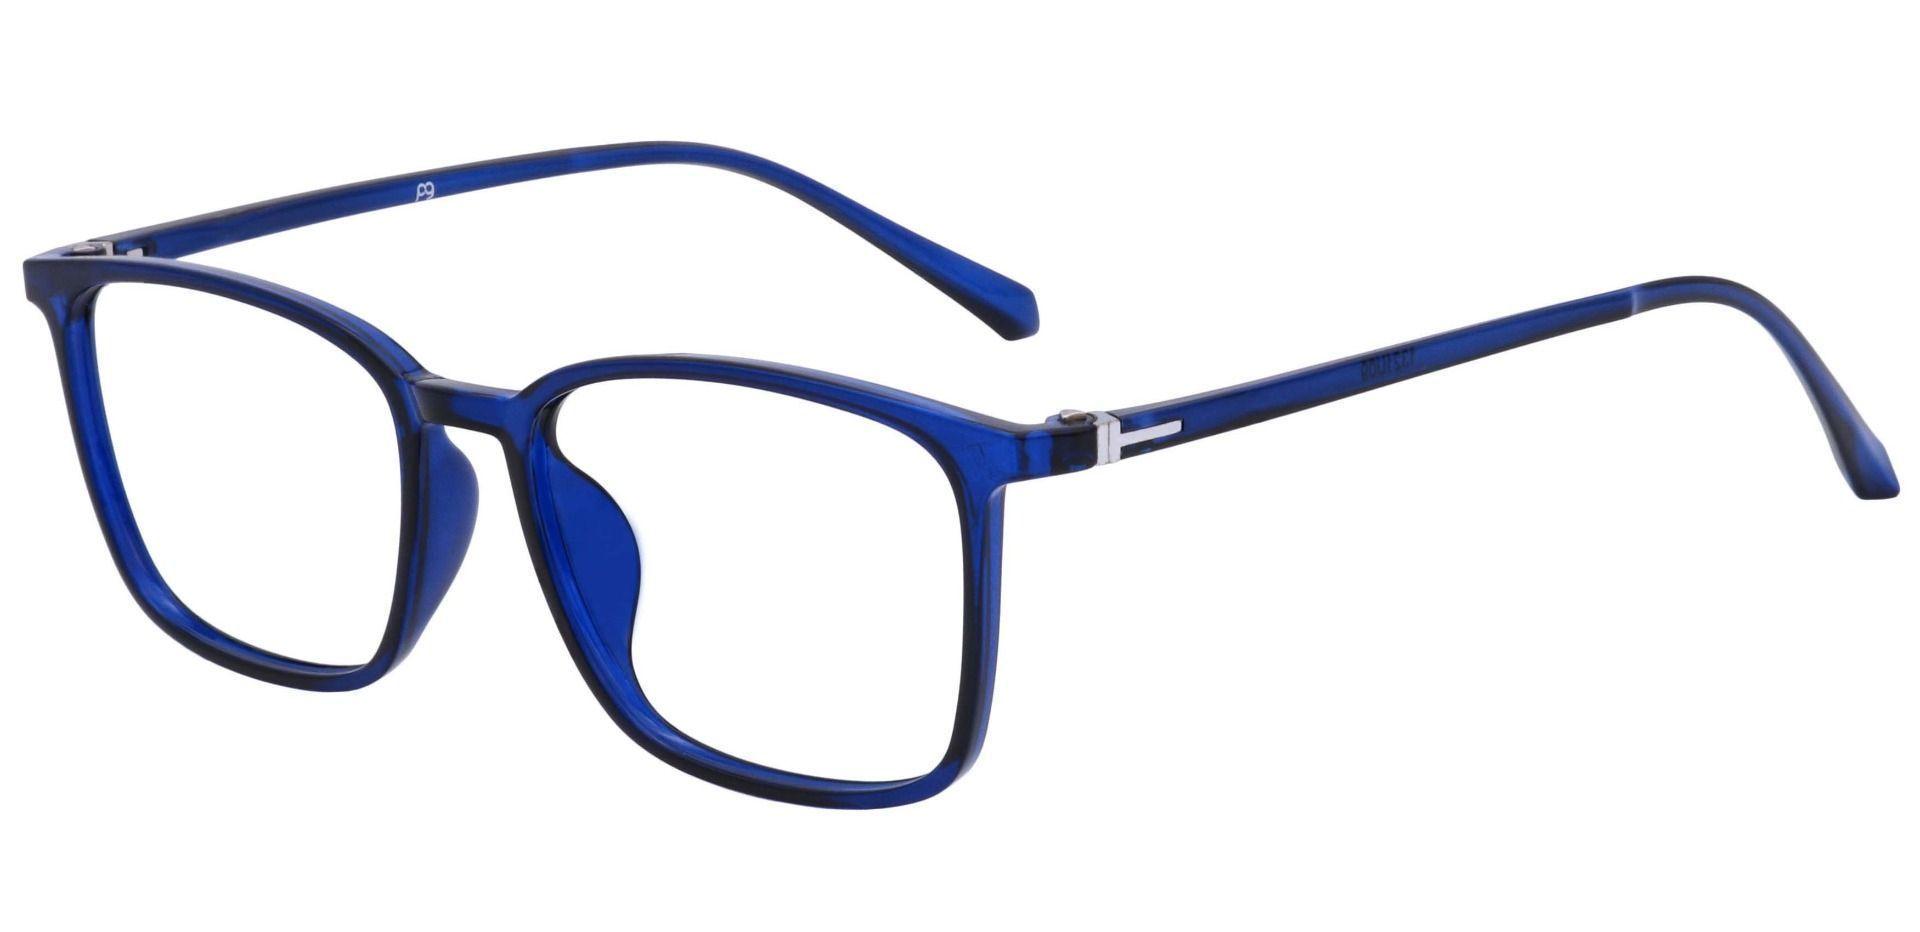 Hayworth Rectangle Blue Light Blocking Glasses - Blue